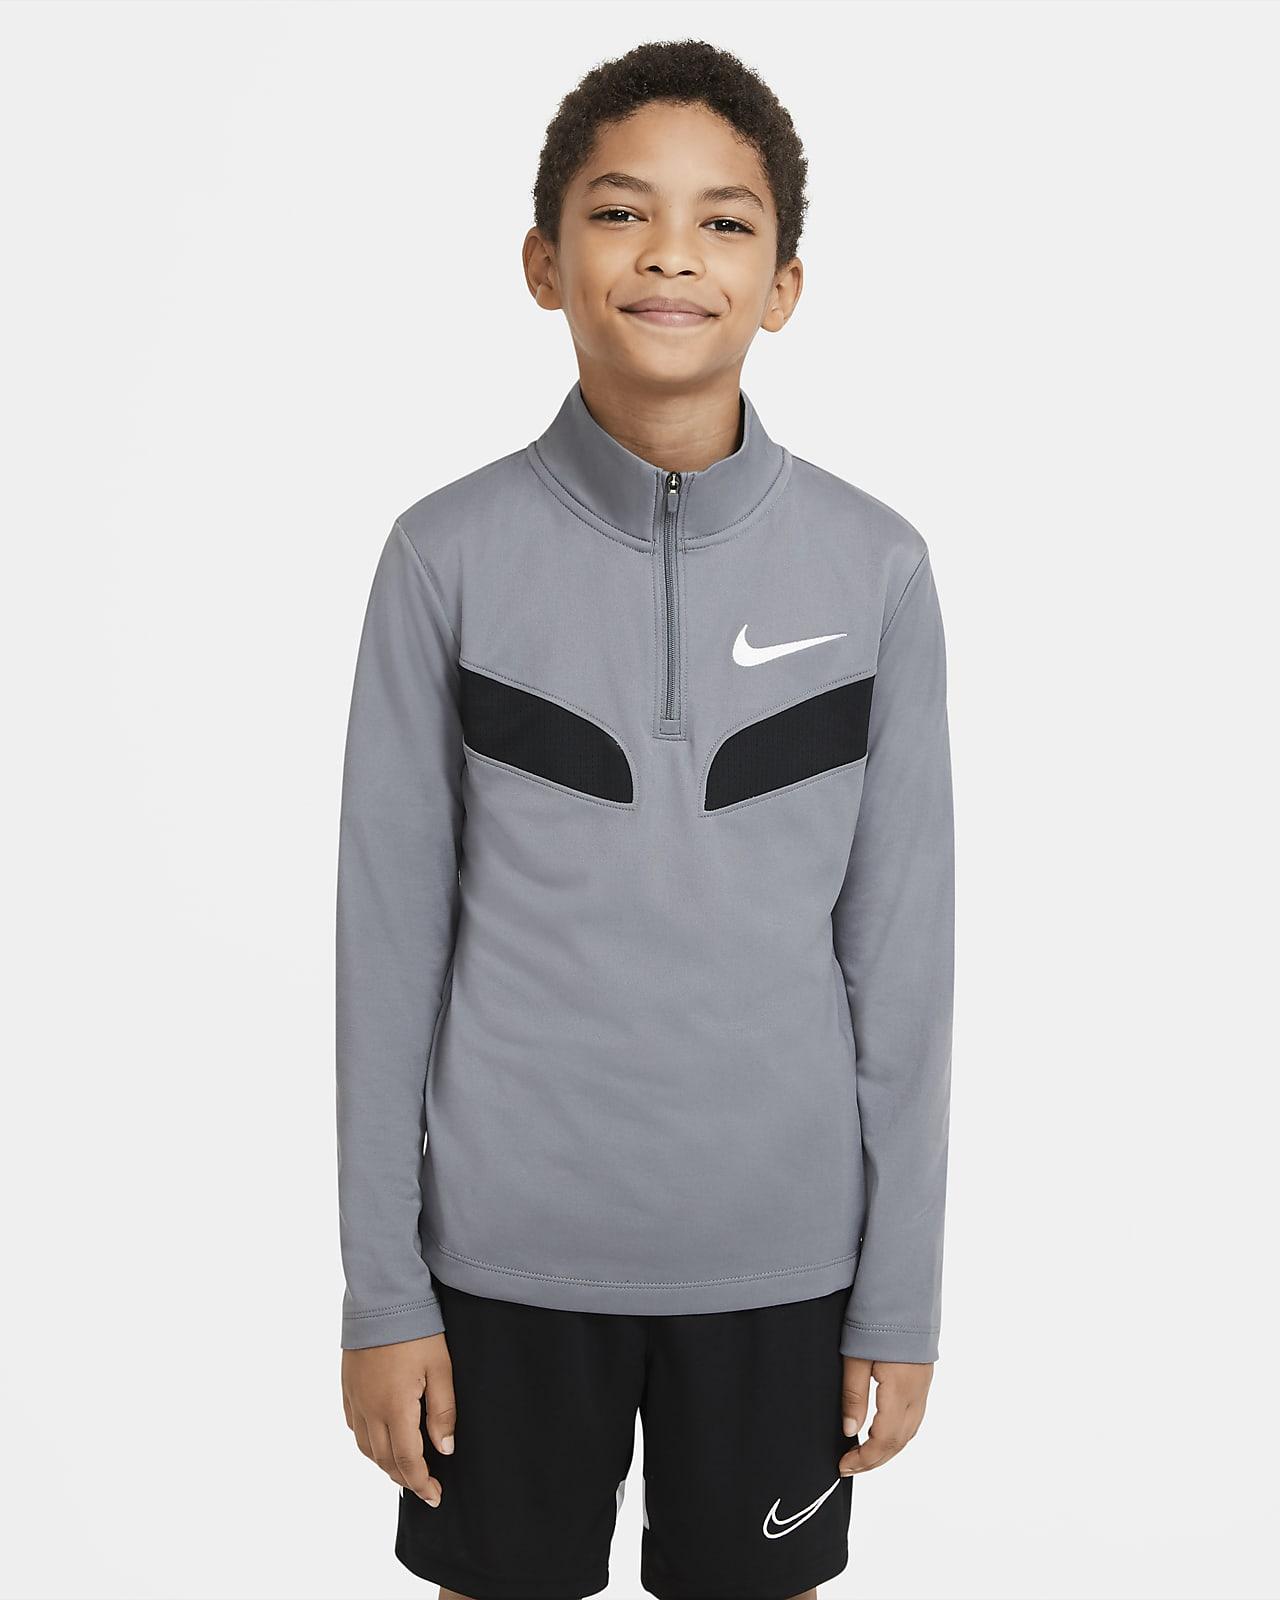 Nike Sport Langarm-Trainingsoberteil für ältere Kinder (Jungen)